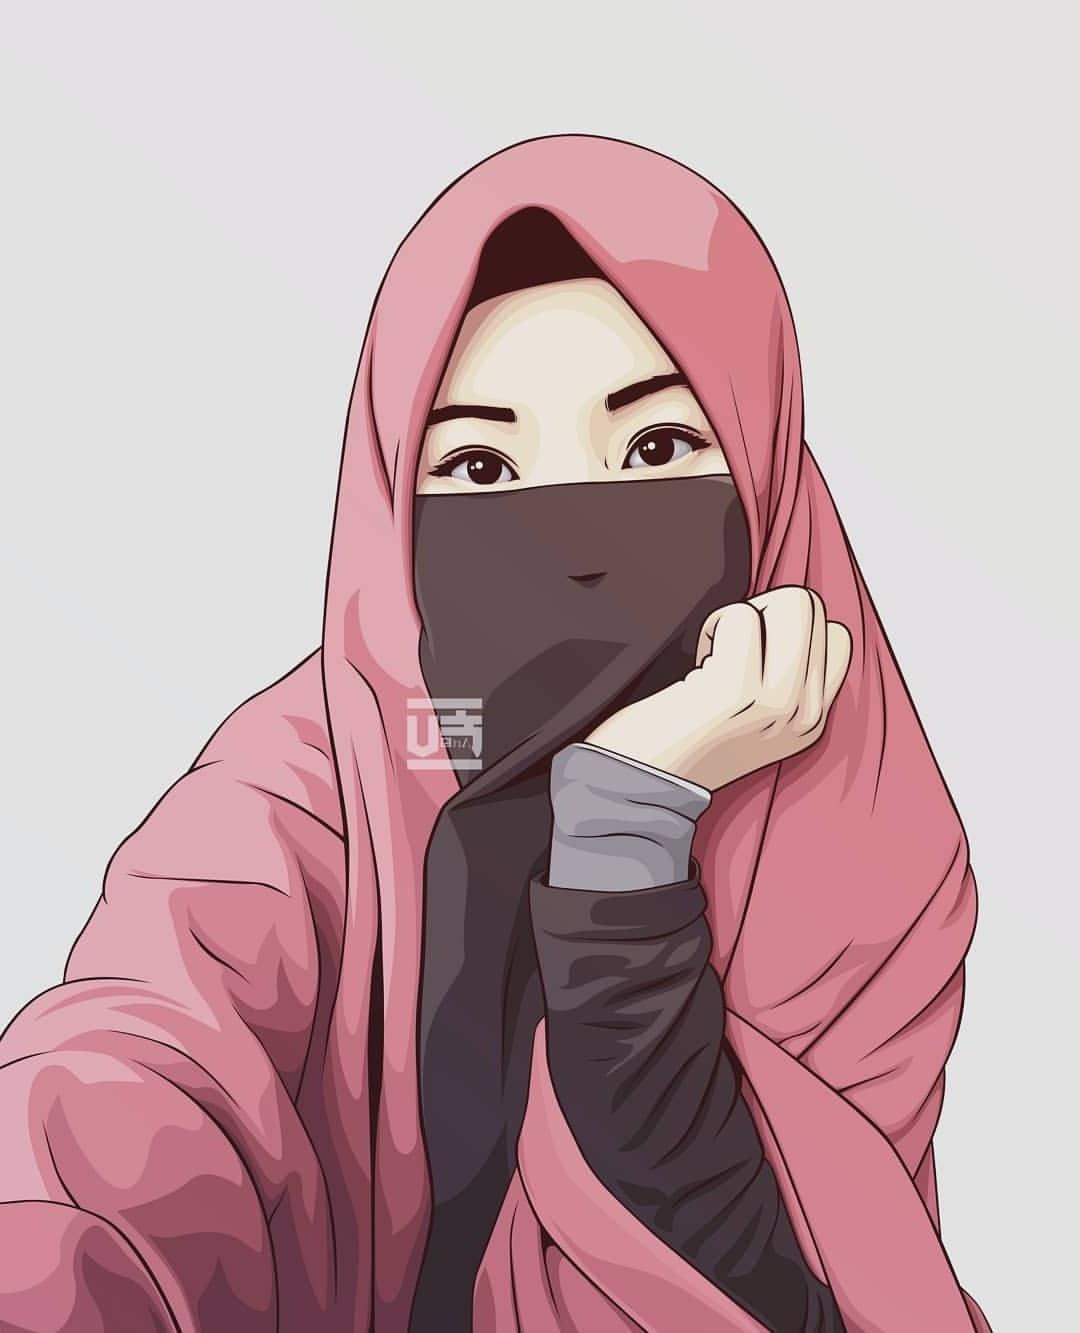 Inspirasi Muslimah Kartun Bercadar 3ldq 1000 Gambar Kartun Muslimah Cantik Bercadar Kacamata El